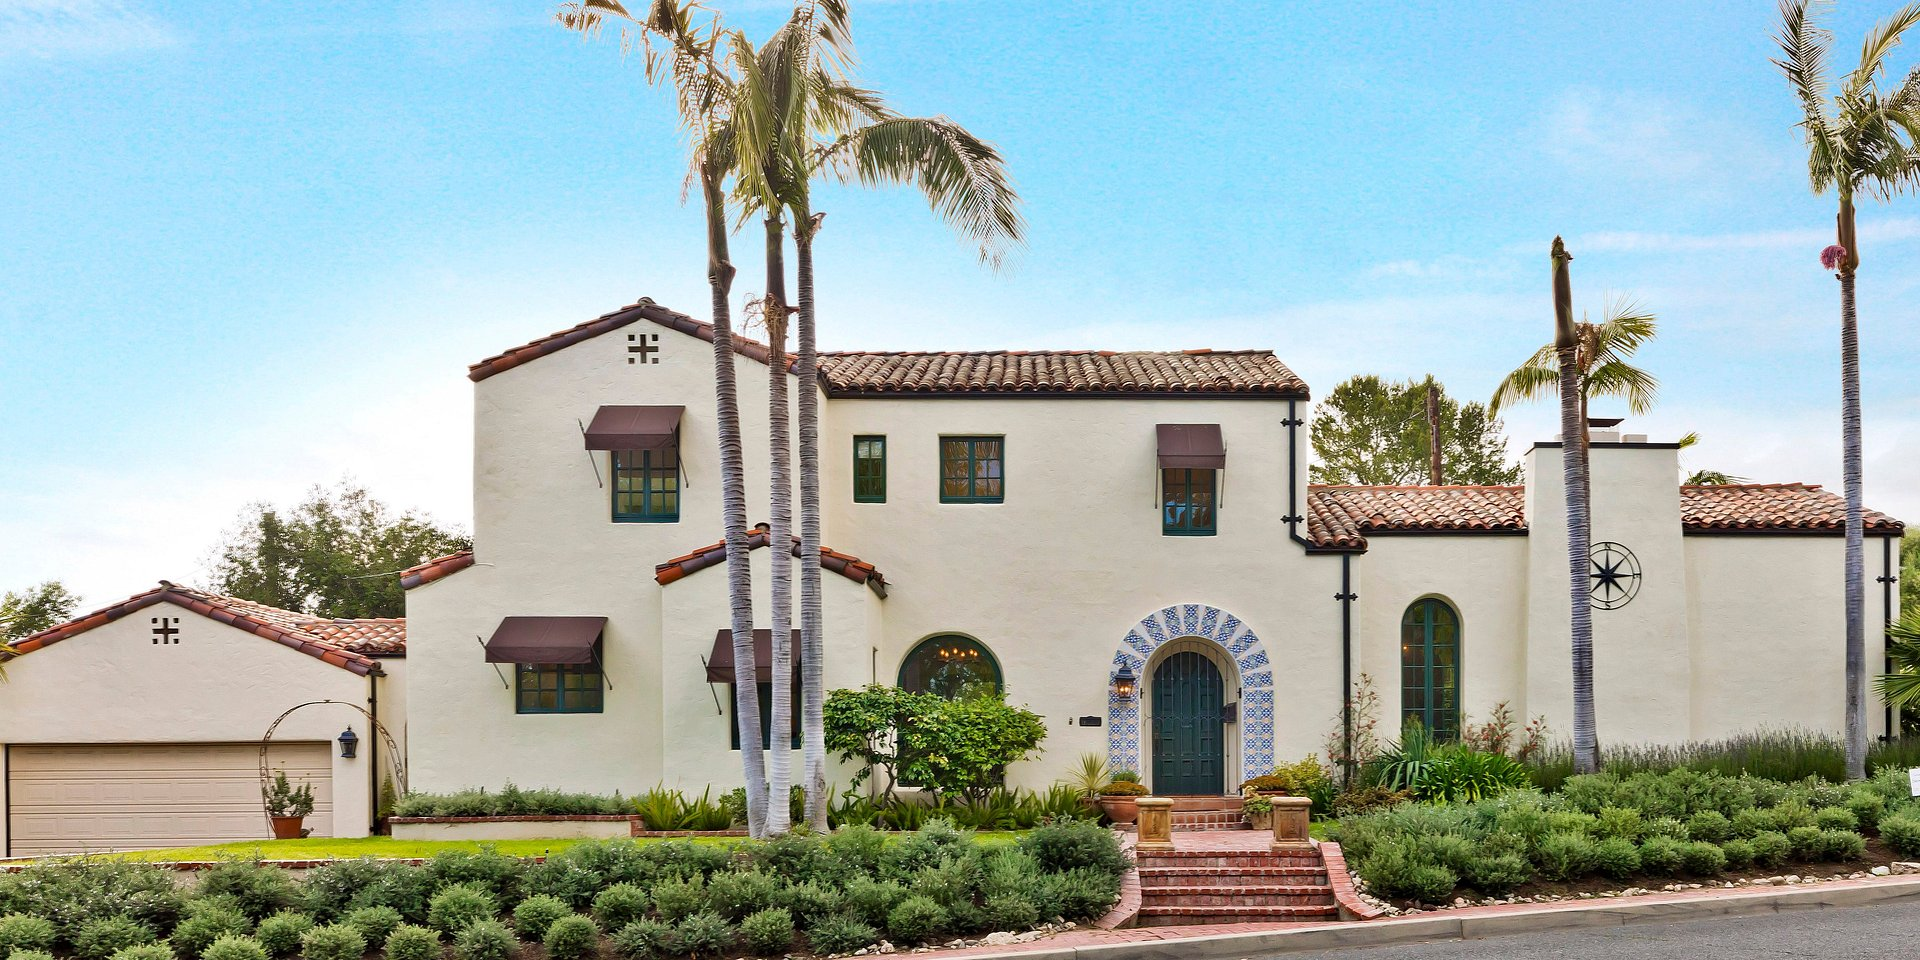 Coldwell Banker Residential Brokerage Lists Glendale Property for $2.15 Million